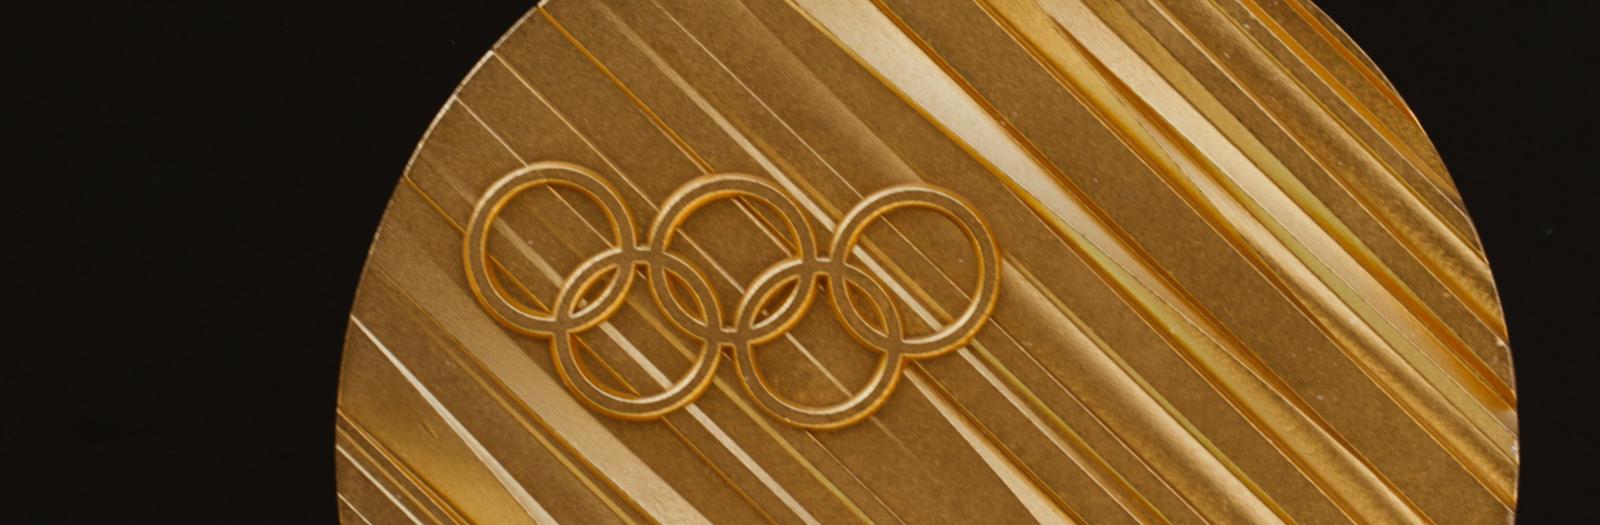 Making Tokyo's 2020 Olympic medals – RPRA